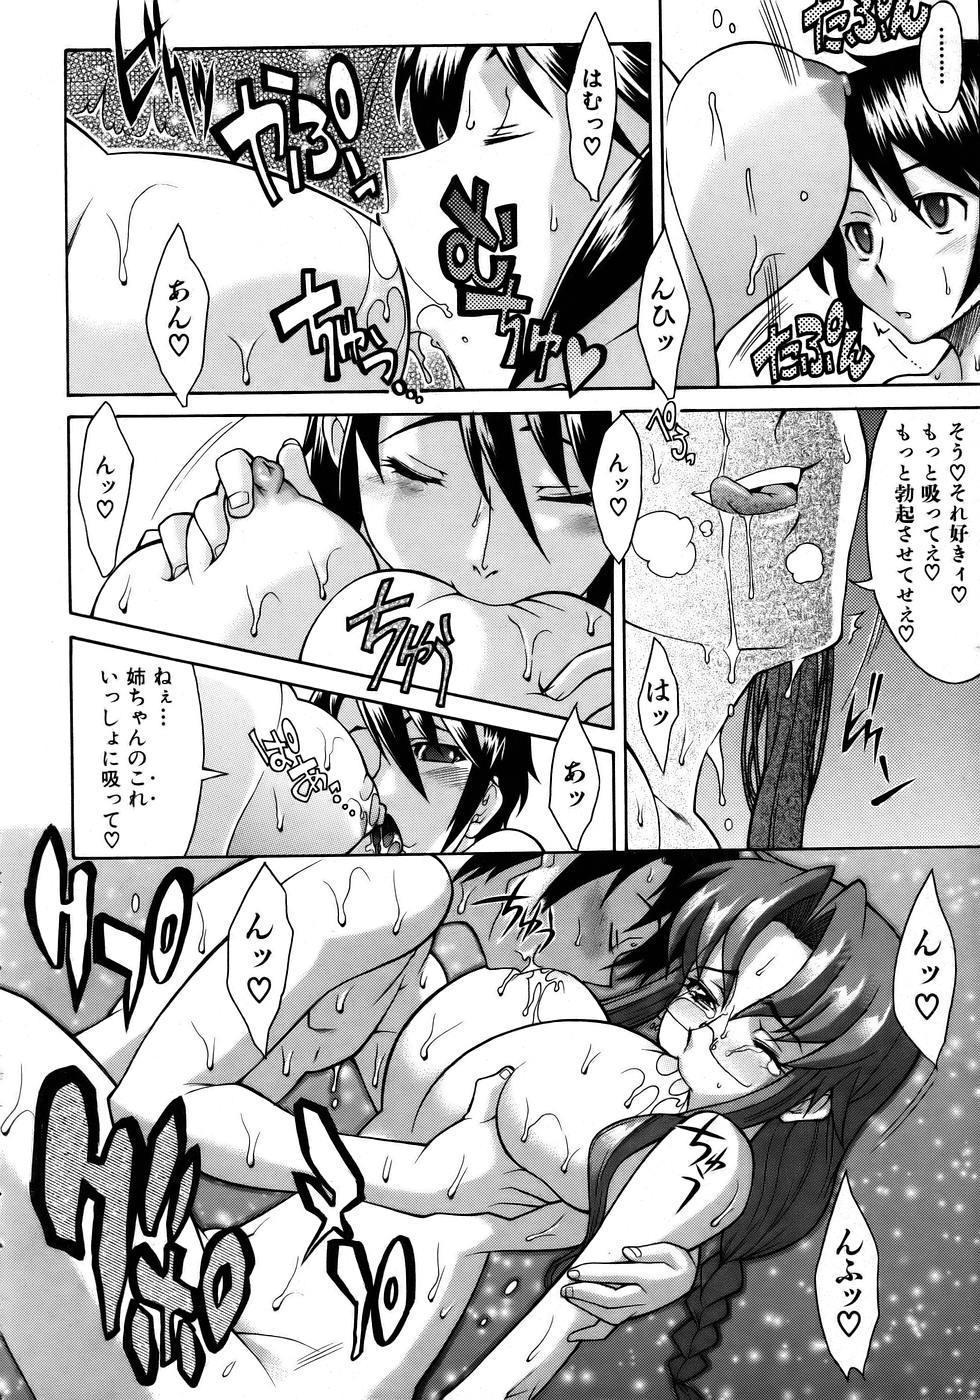 COMIC AUN 2005-12 Vol. 115 103